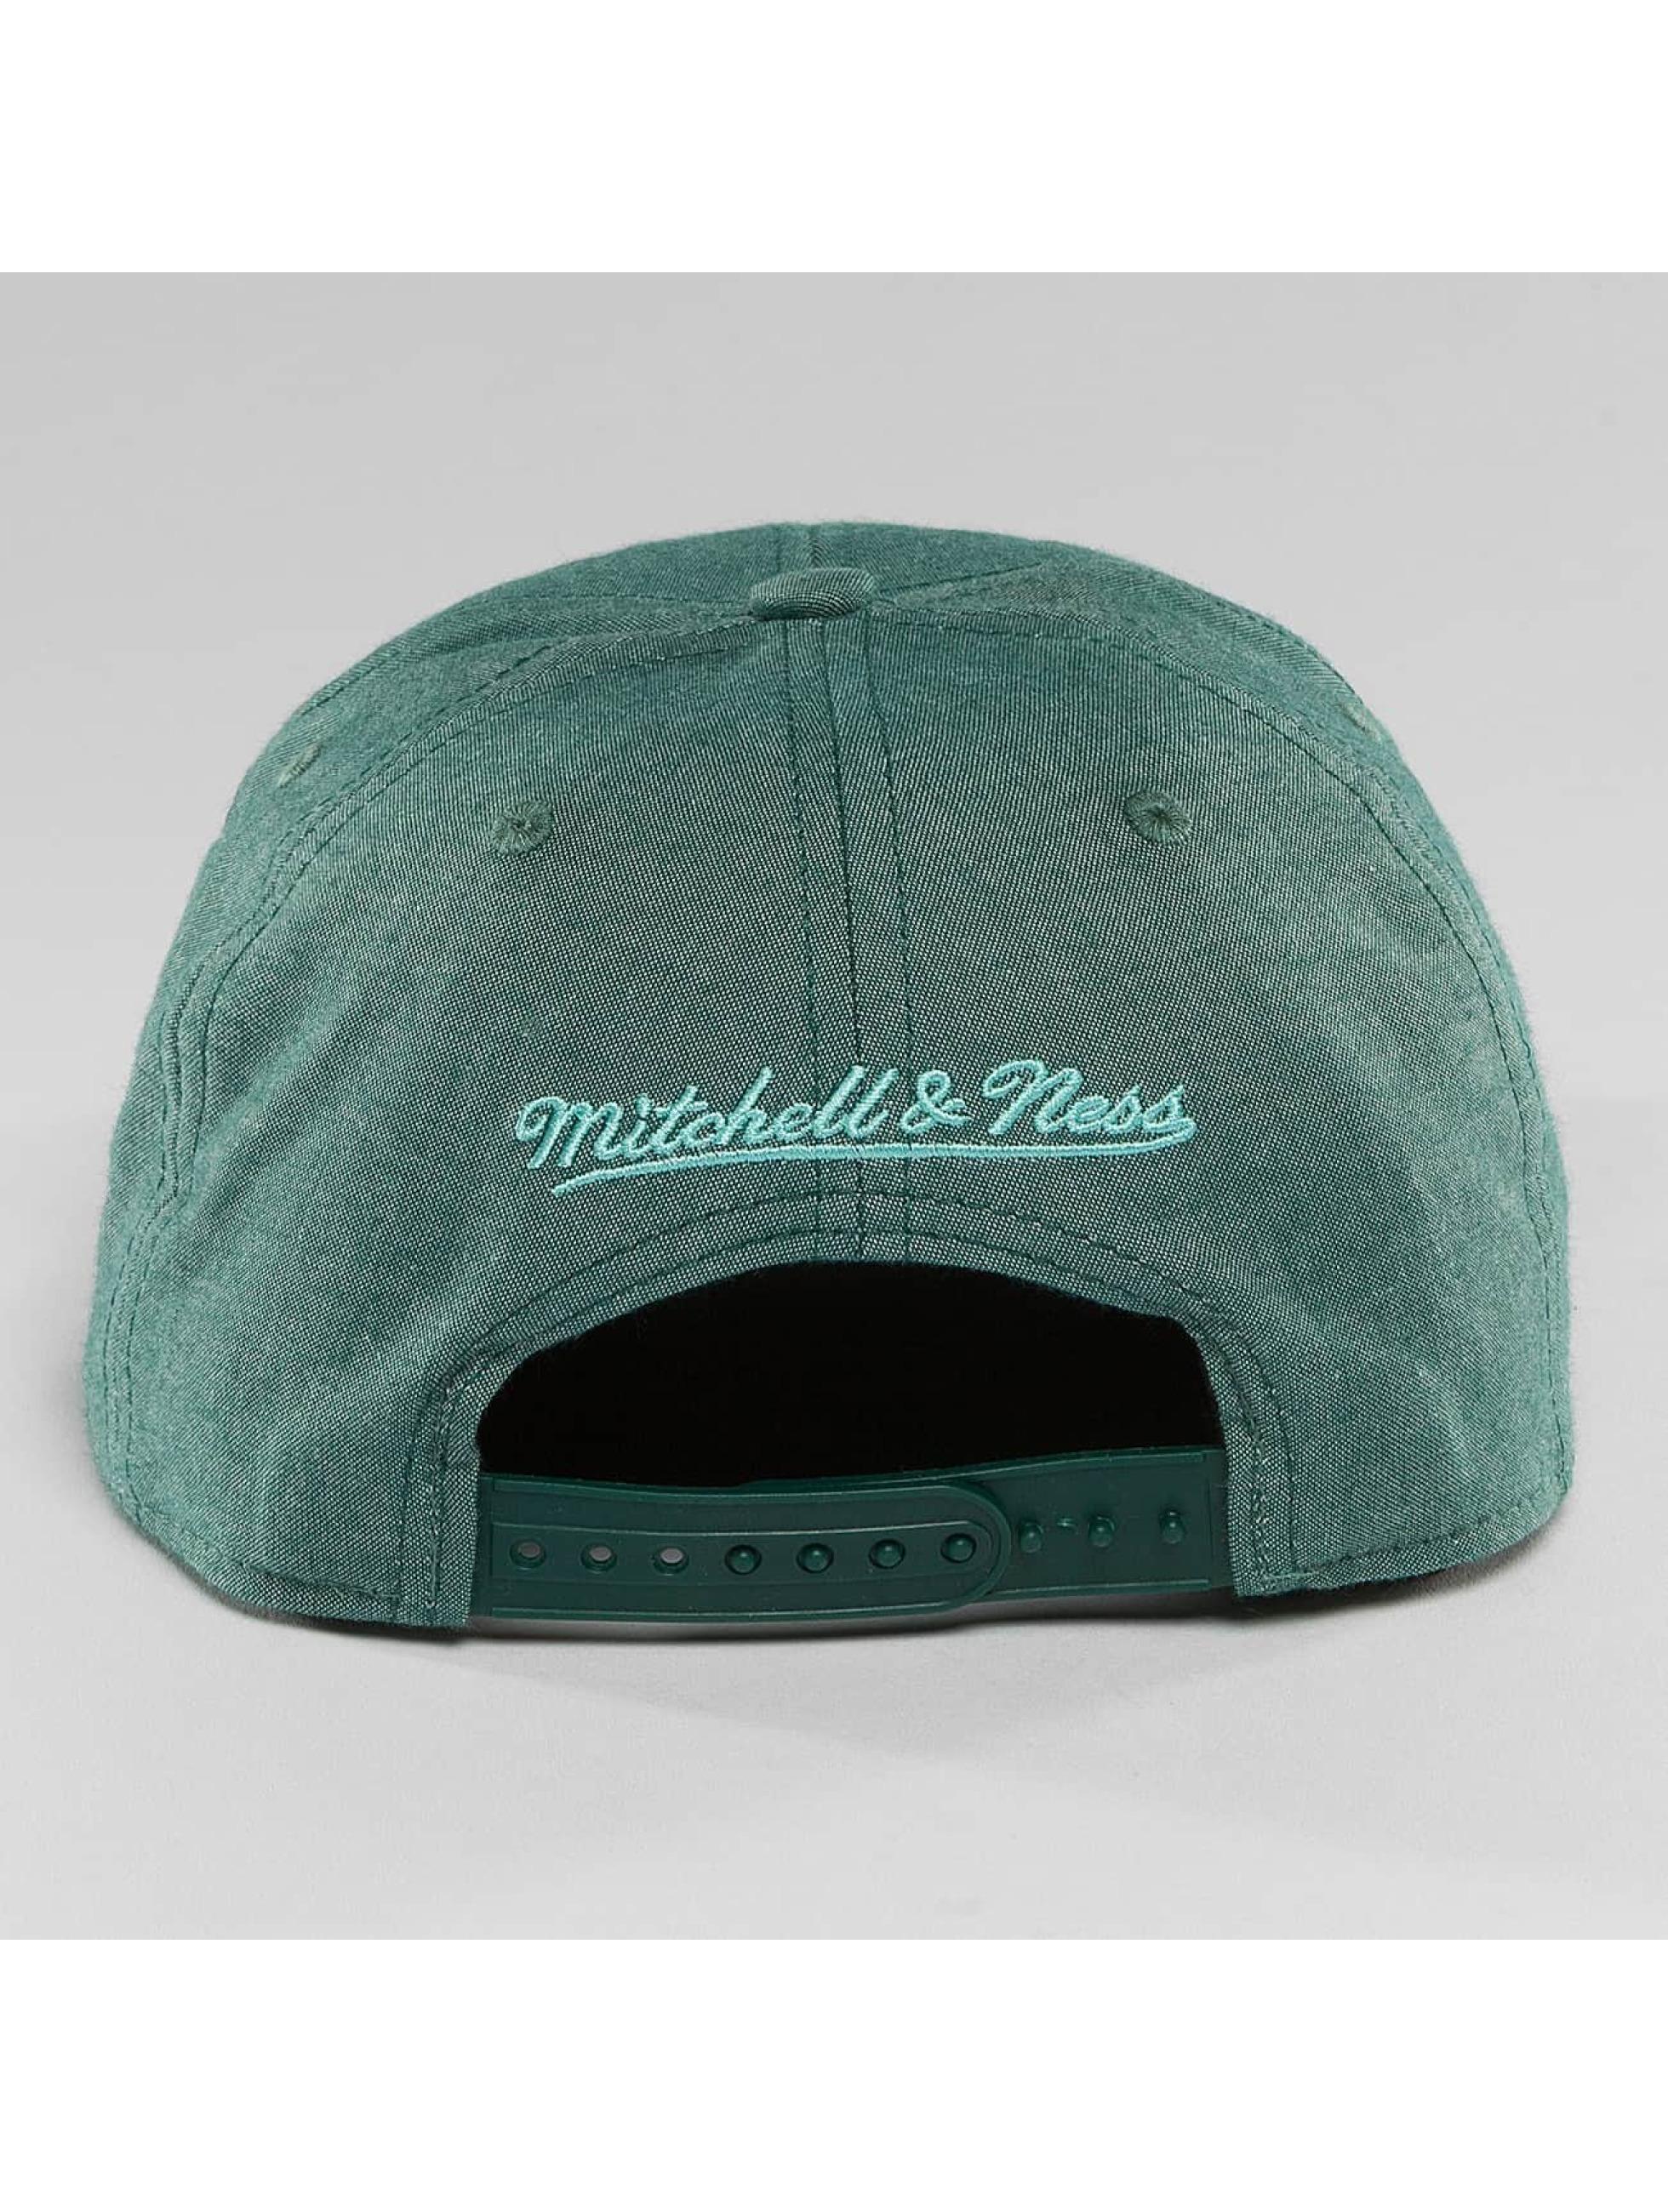 Mitchell & Ness Snapback Cap Italian Washed olive